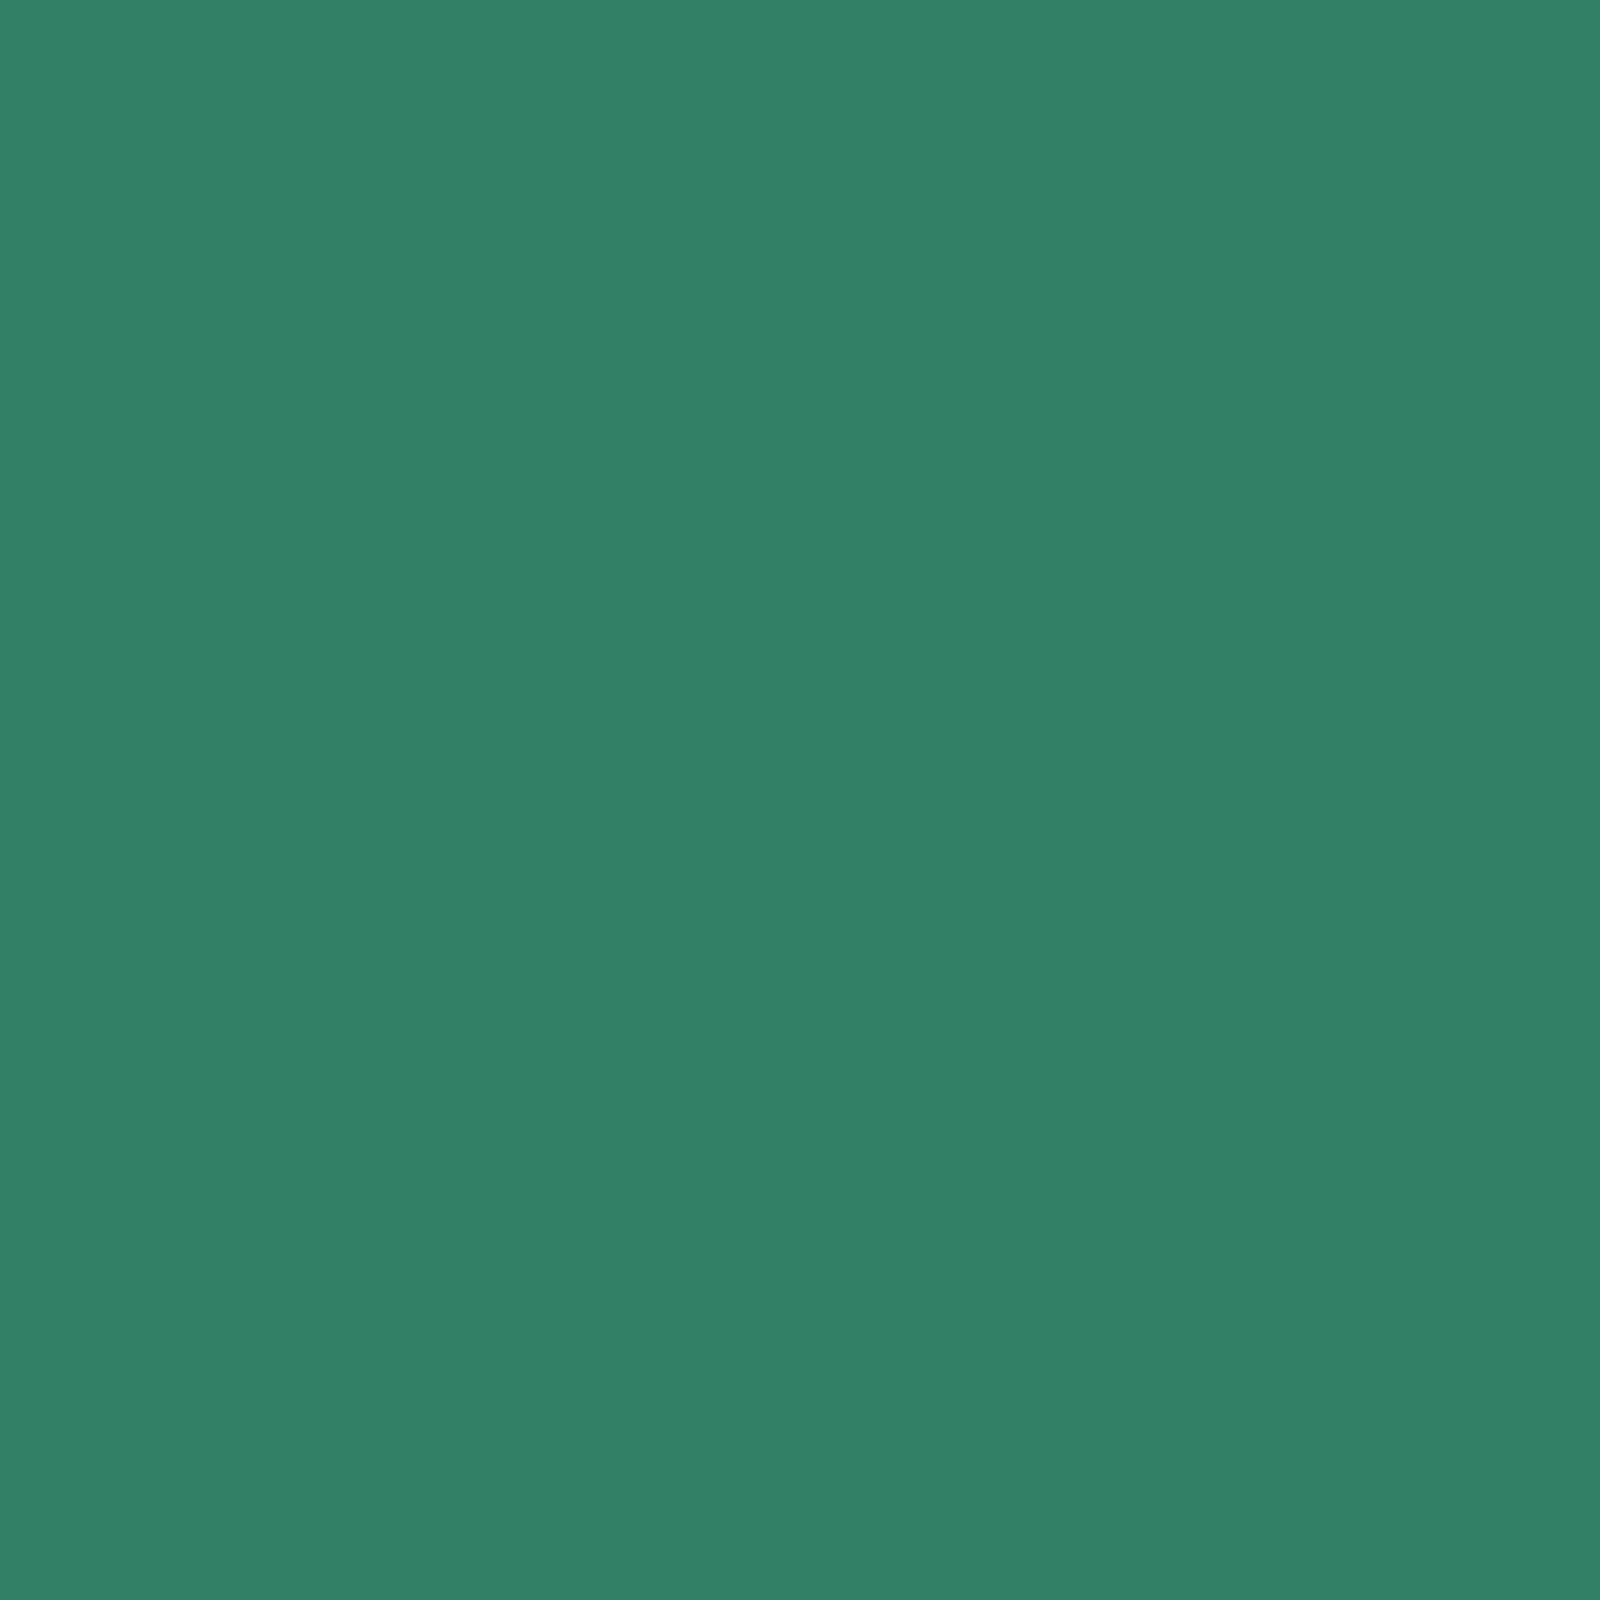 Solid - Spearmint<br/>RJR 9617-389